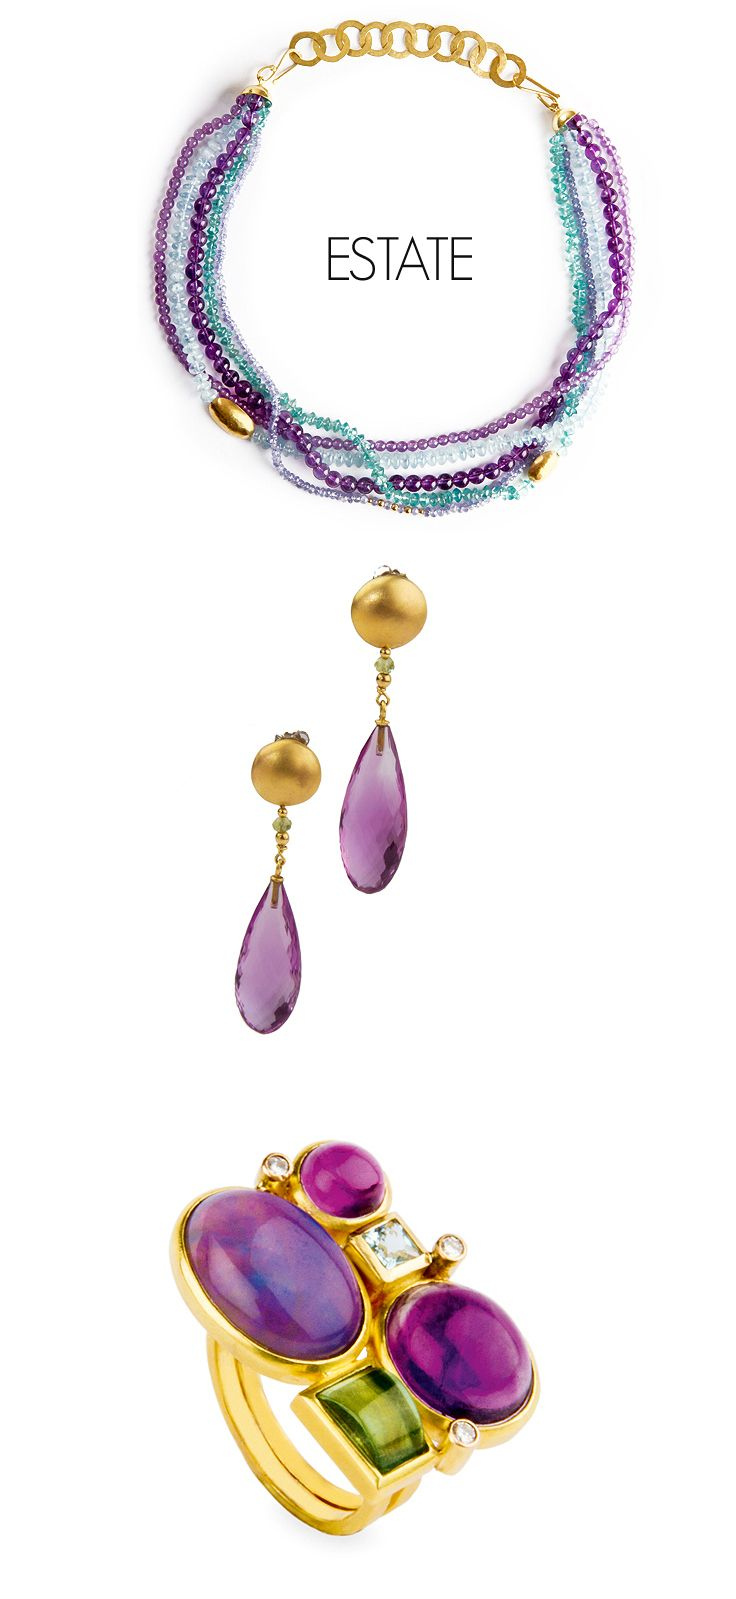 Estate - Summer #Parure #Estate #Summer #Jewellery #Gioielli #Italy